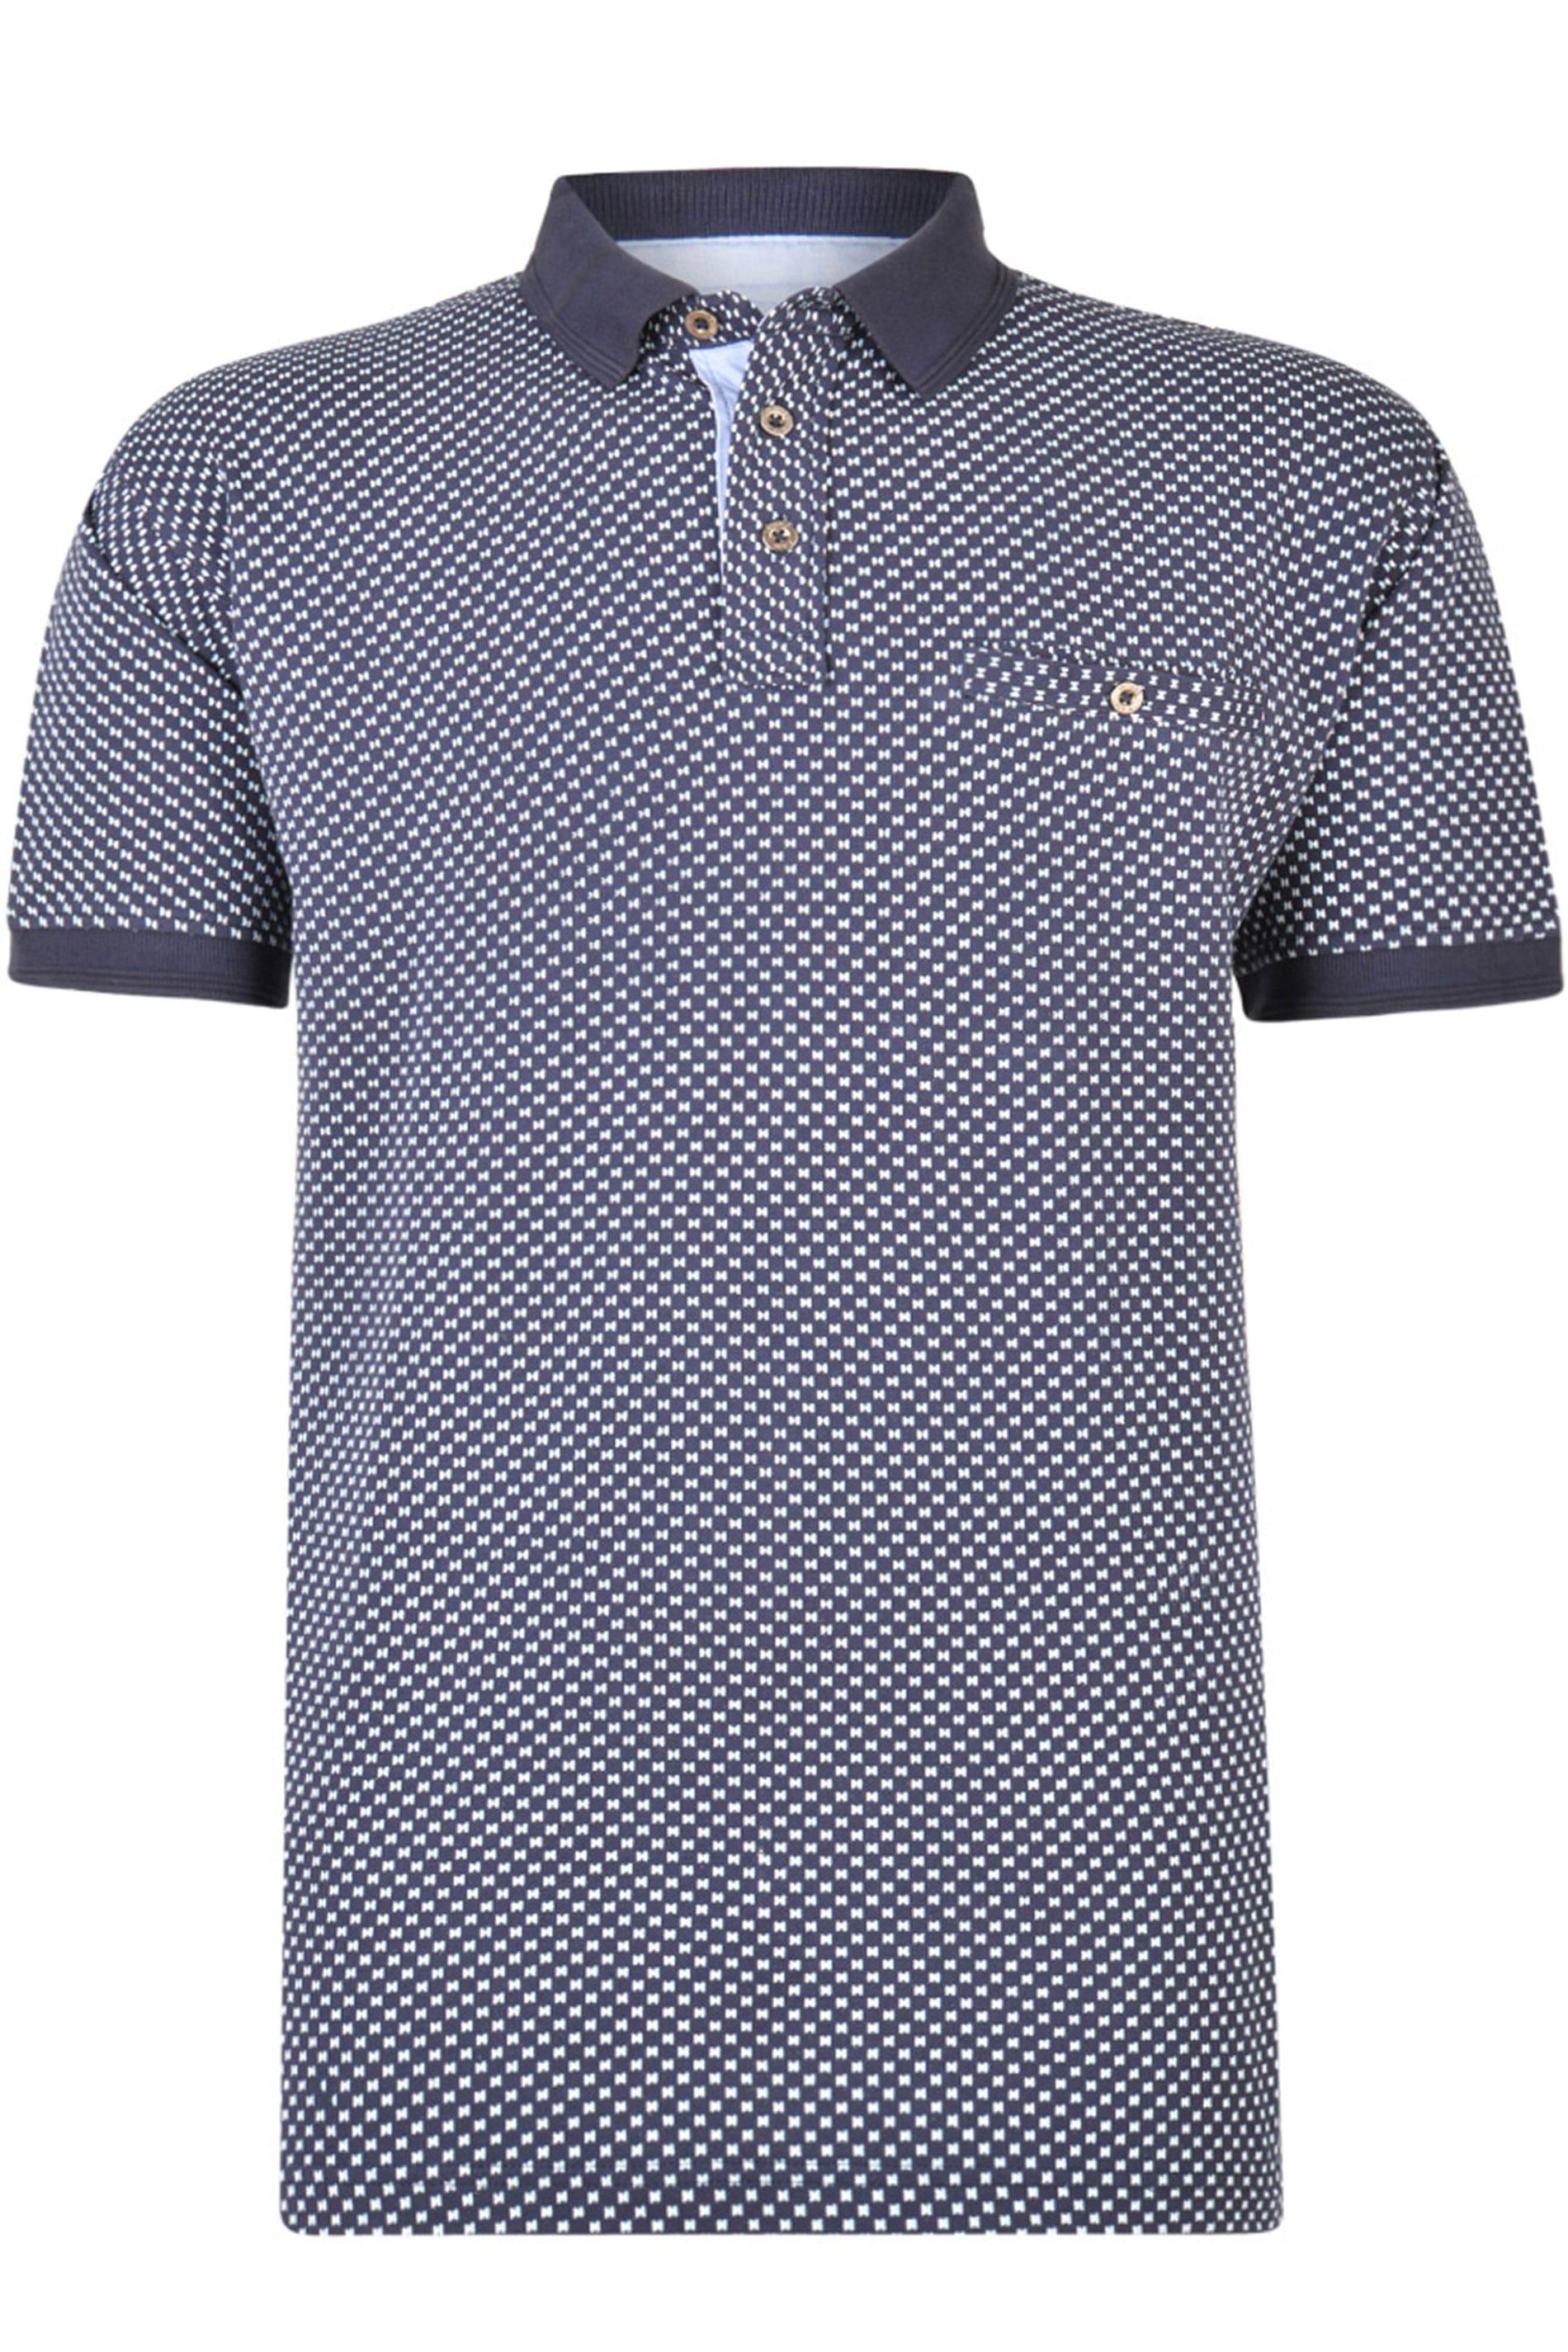 KAM Navy Dobby Print Polo Shirt